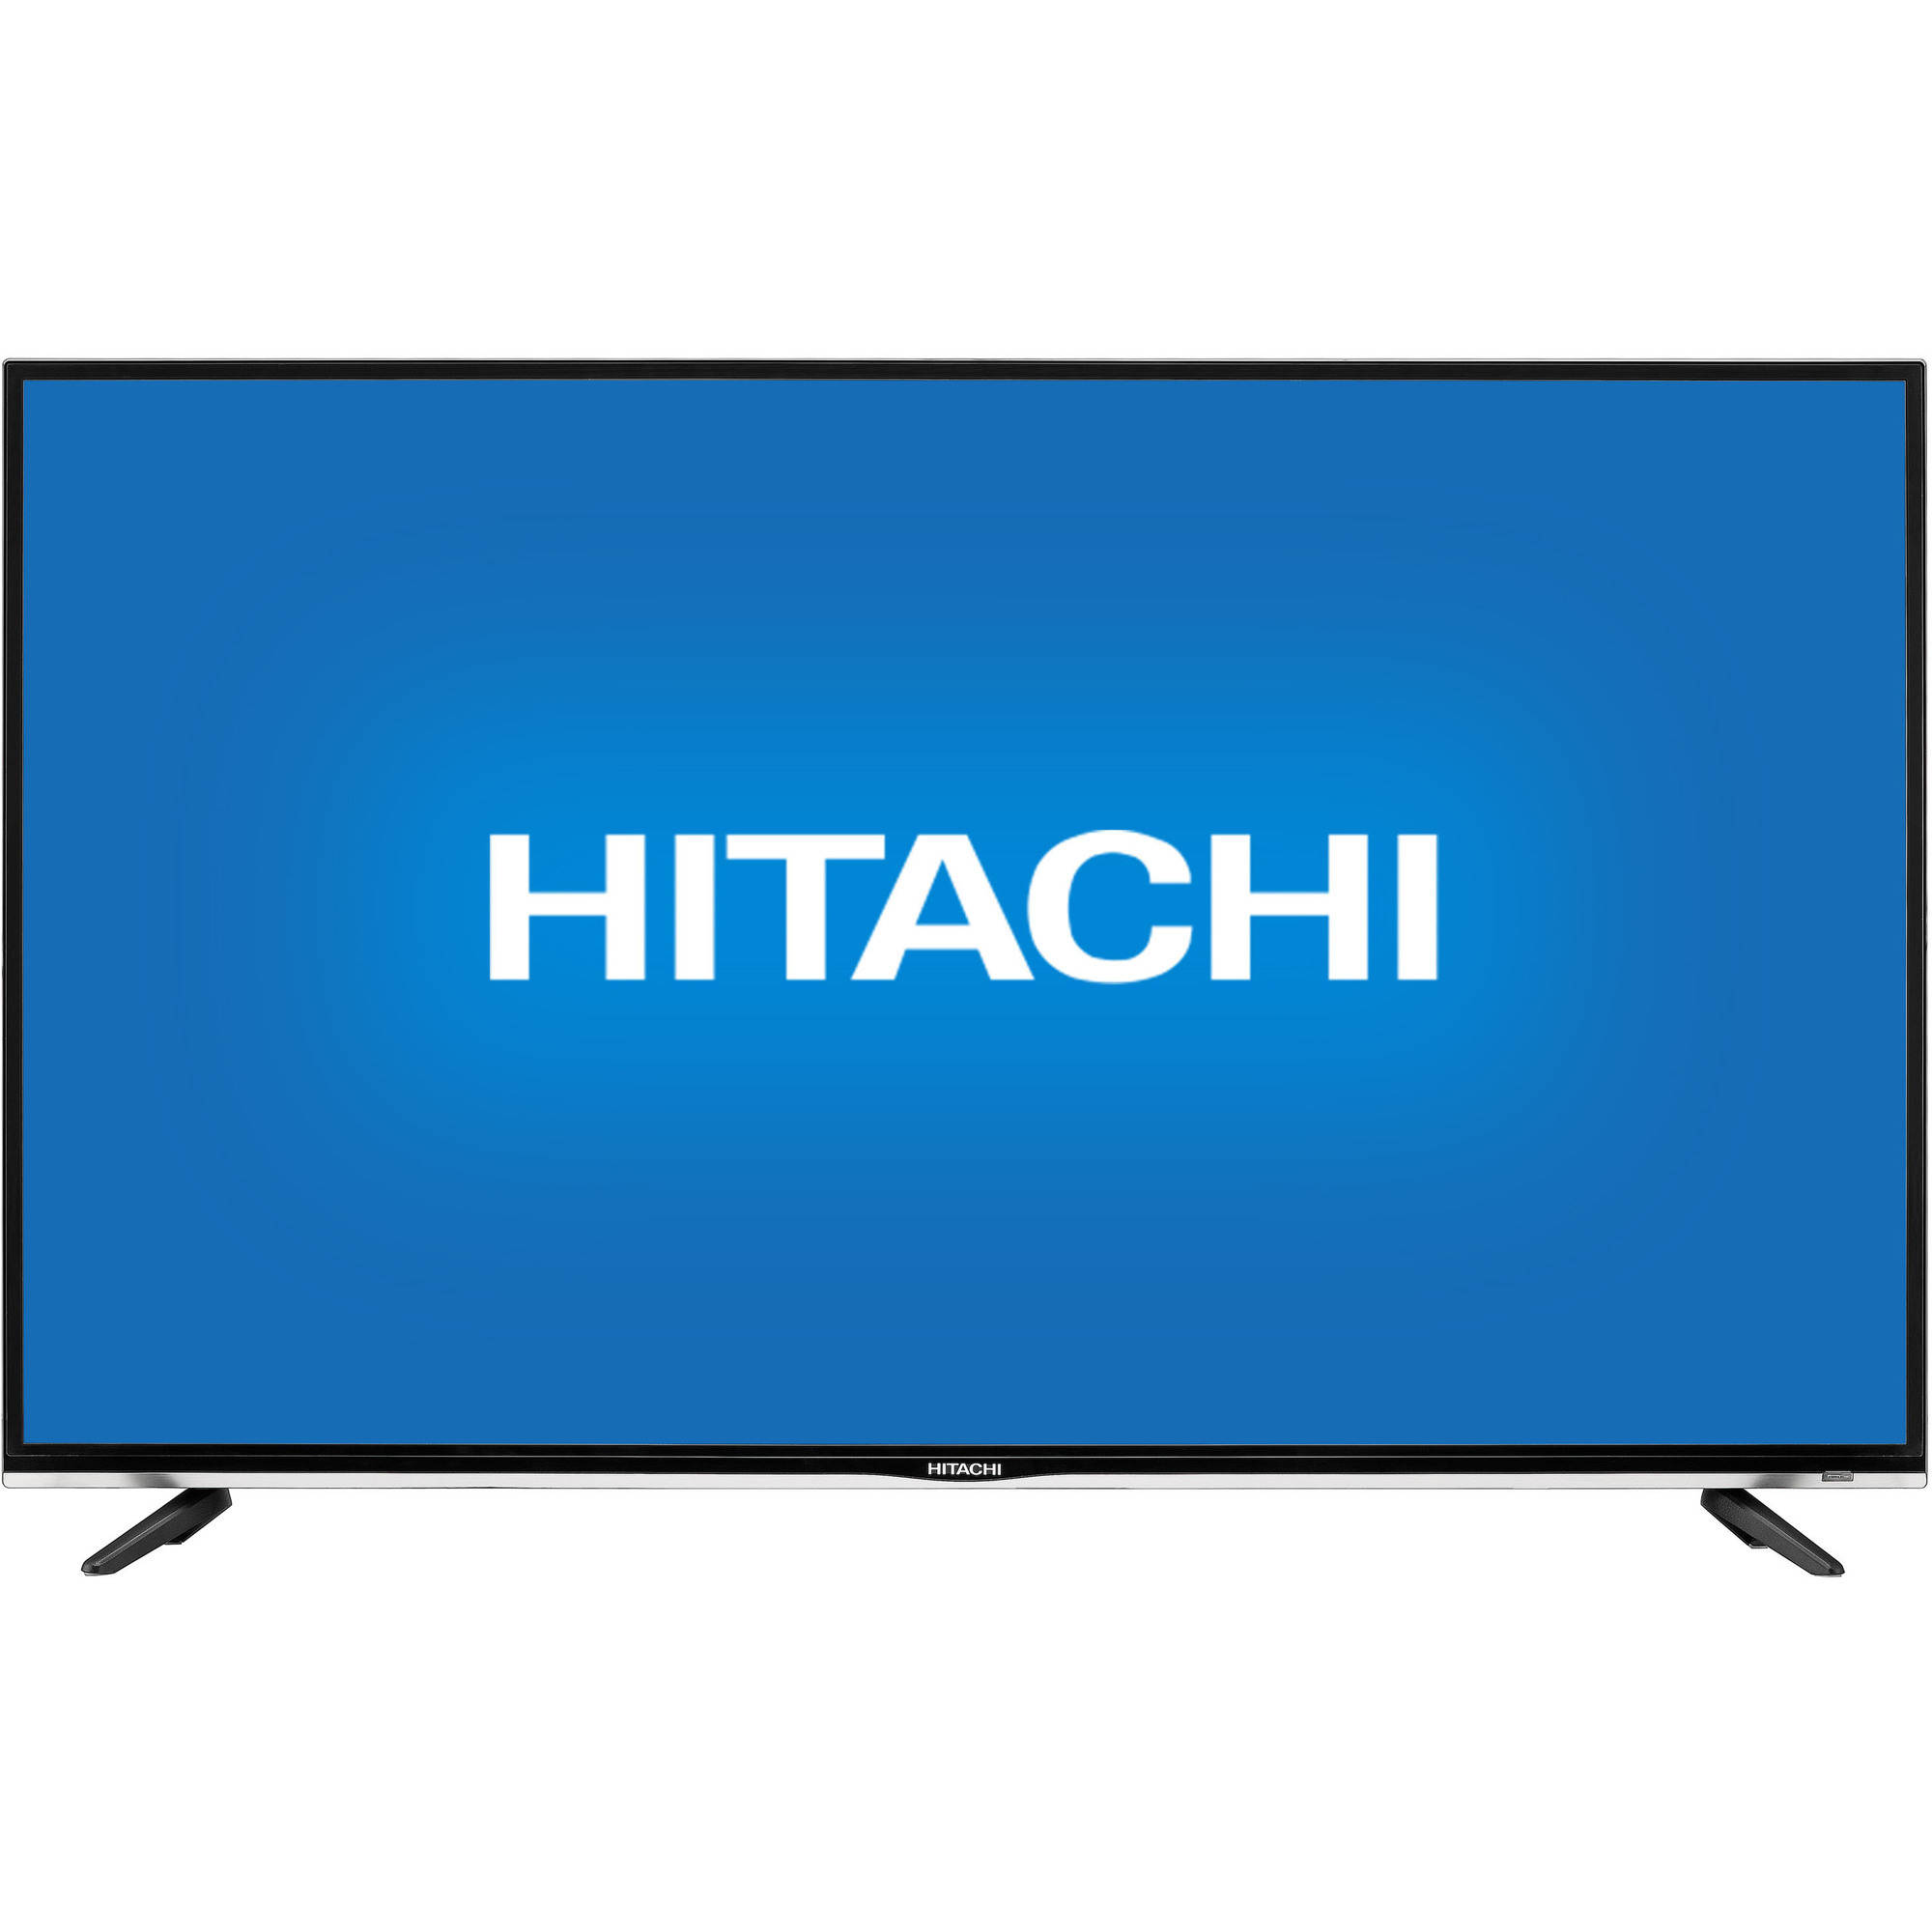 "Hitachi 50"" Class Alpha Series Full HD, LED TV 1080p, 60Hz (50A3) by Hitachi"